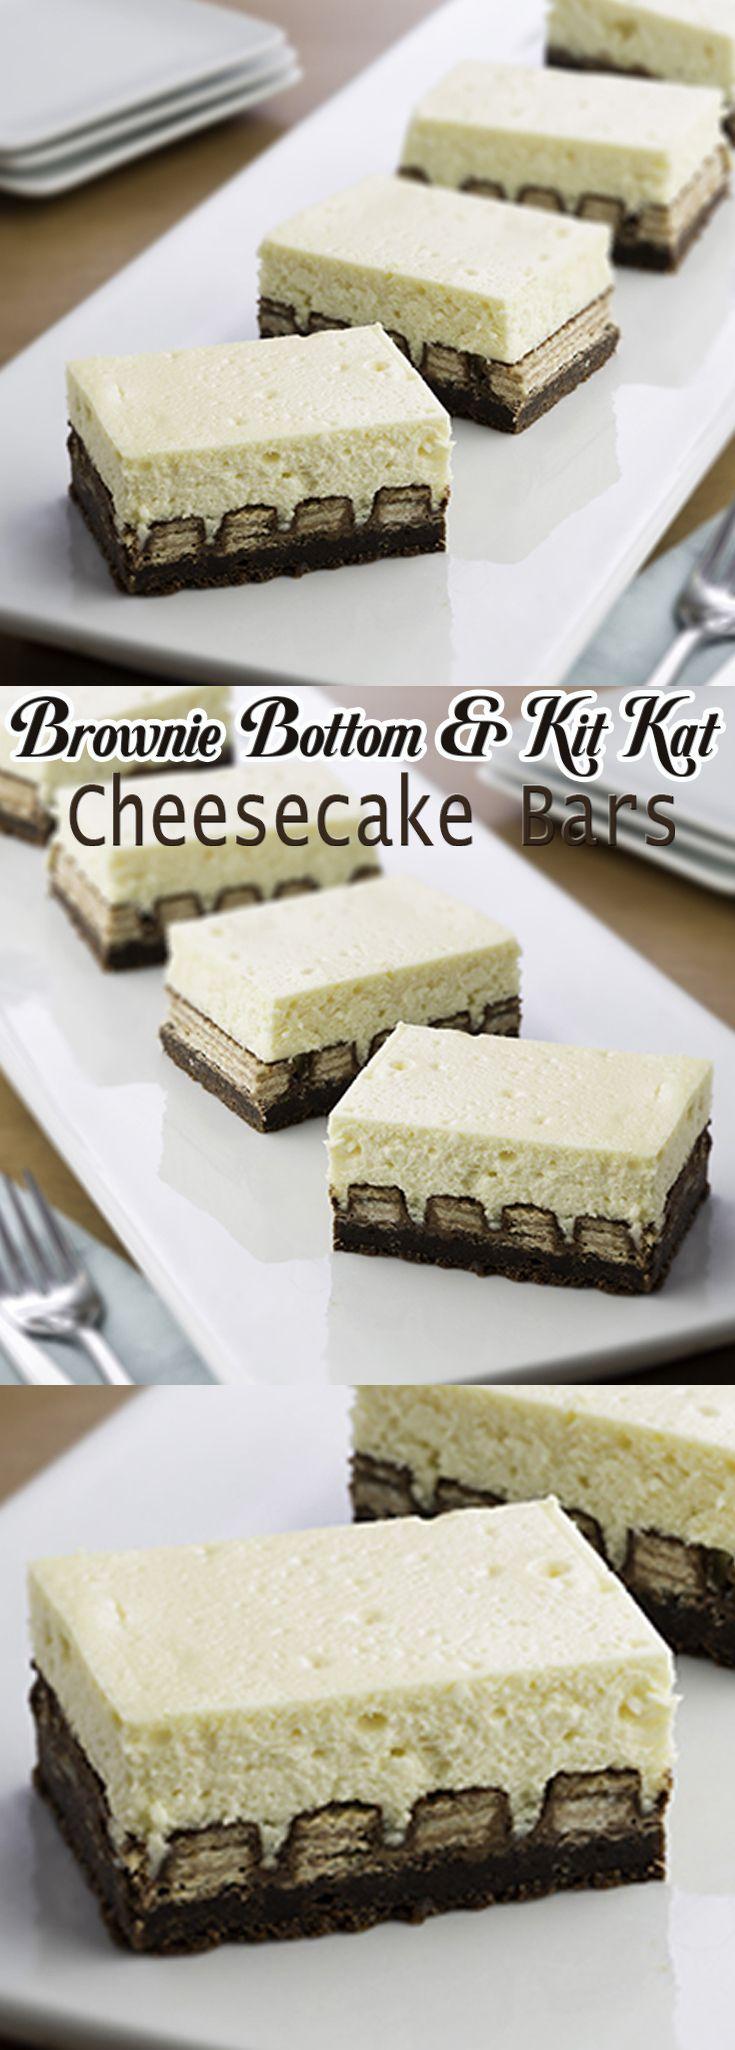 Brownie Bottom and Kit Kat Cheesecake Bars